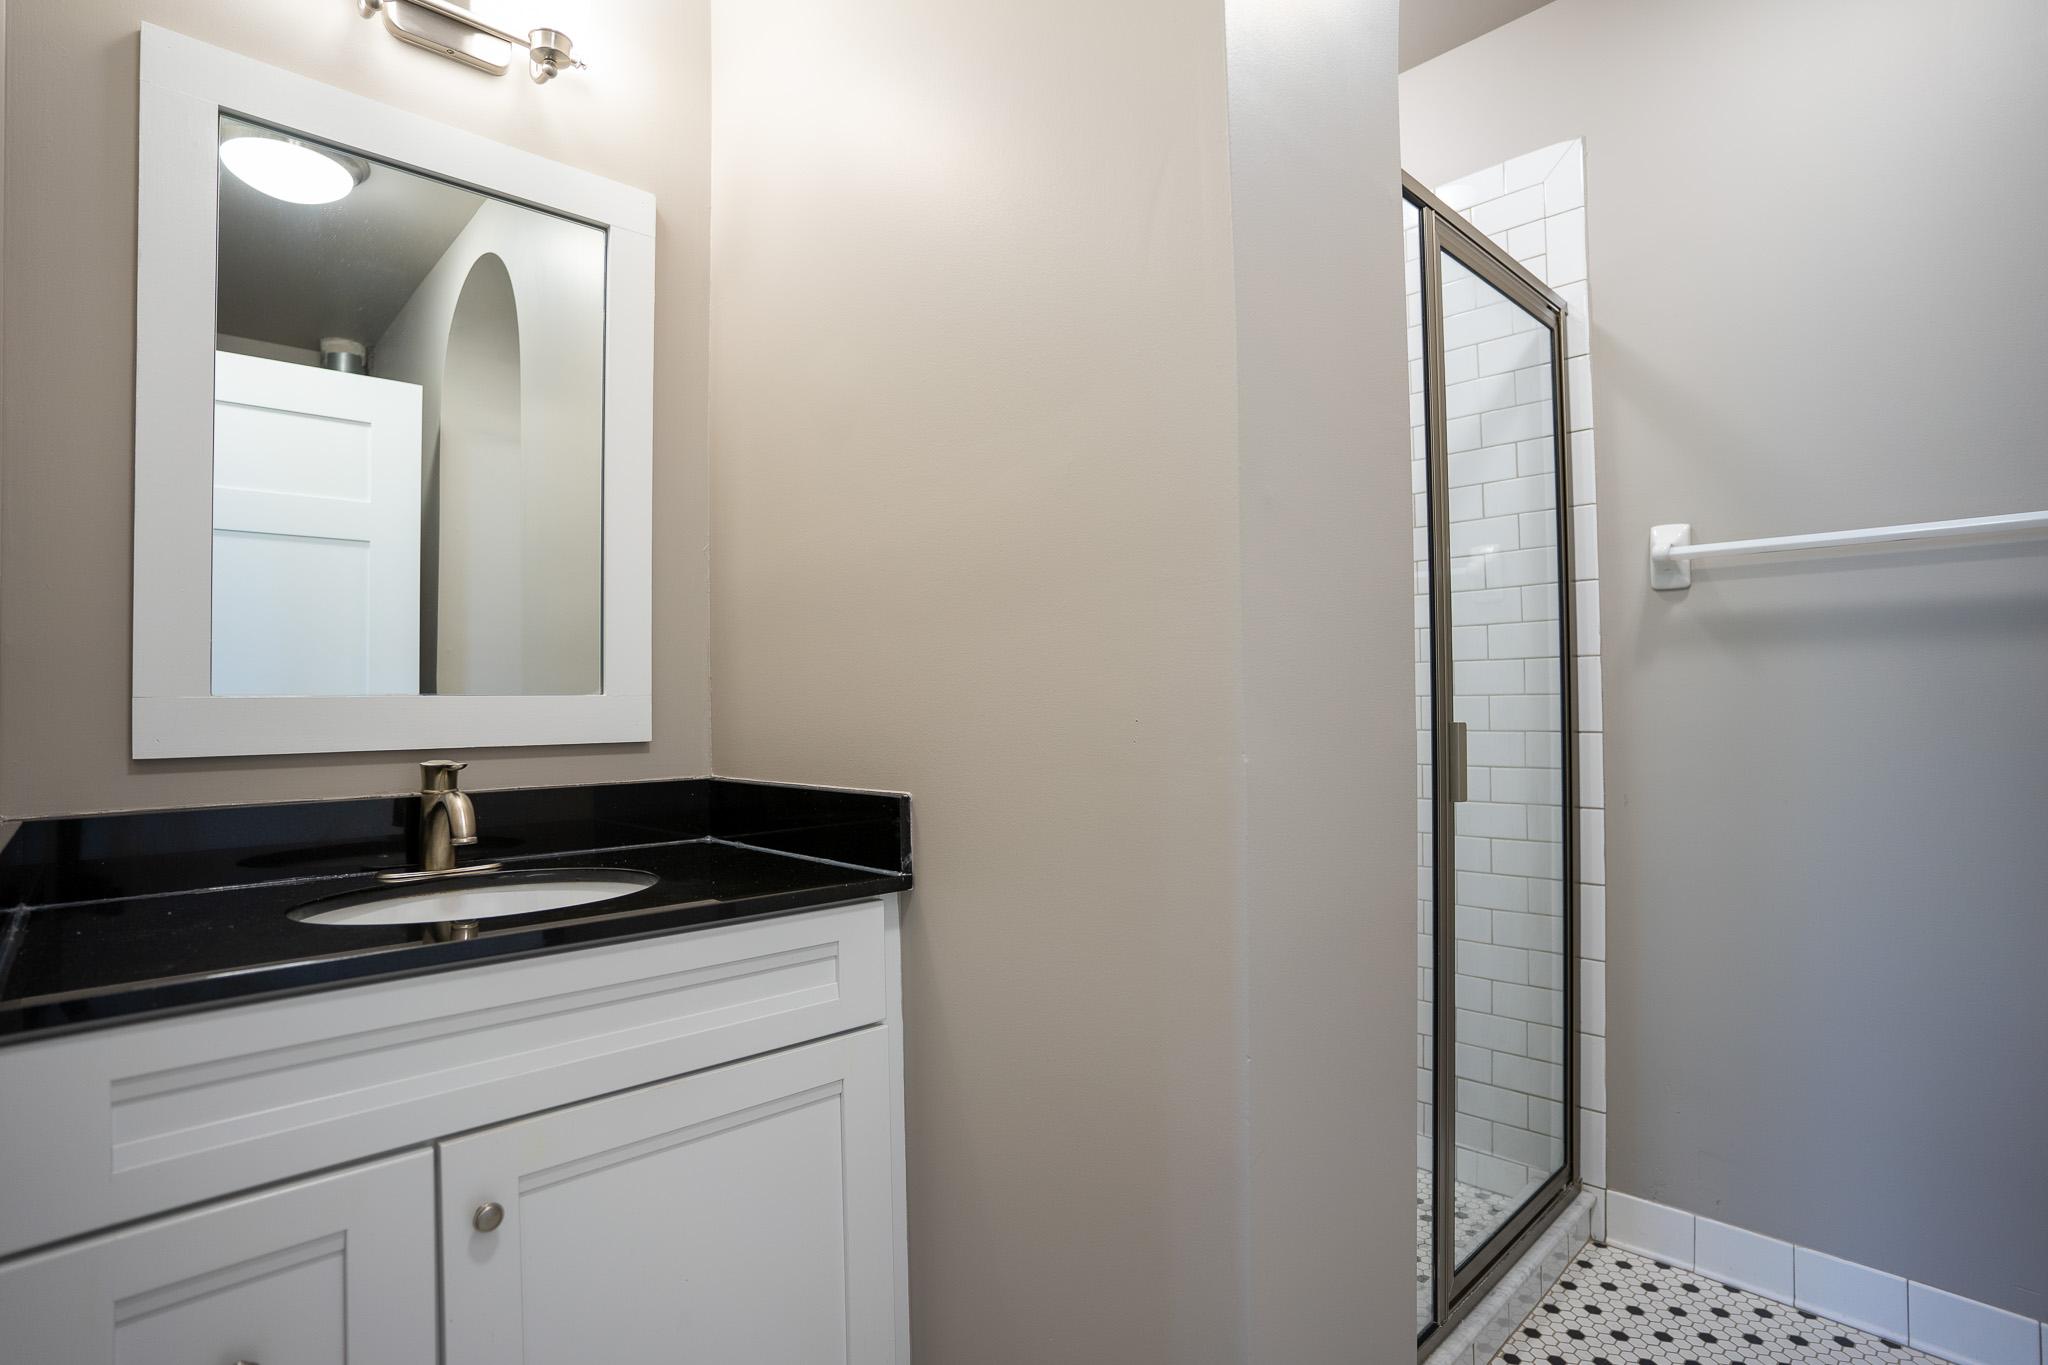 300 Alexander Apartments - Floorplan - 1 Bedroom 1 Bath (Every Floor Plan Is Unique)